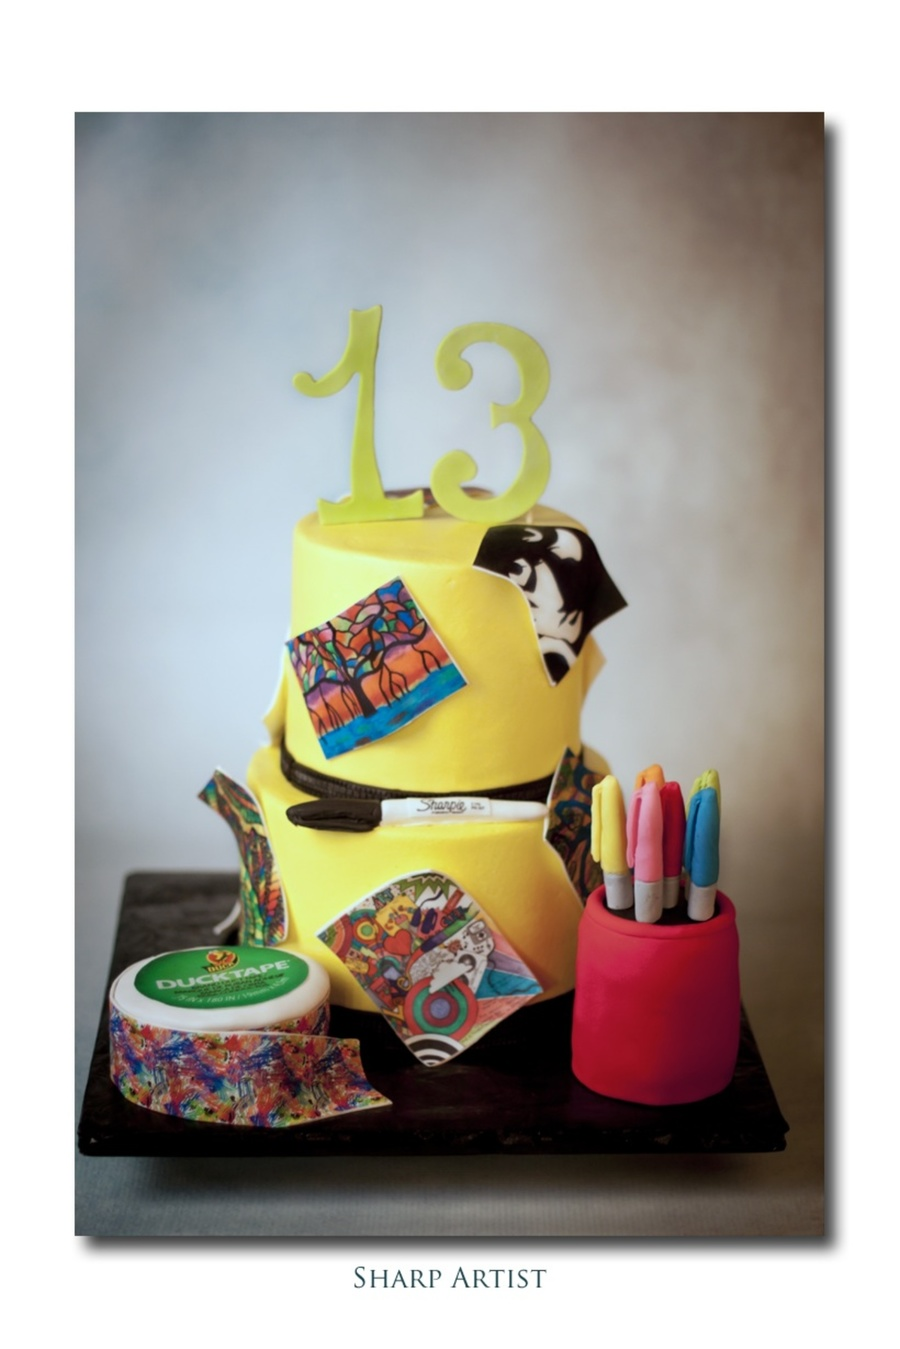 50 Year Old Birthday Cakes